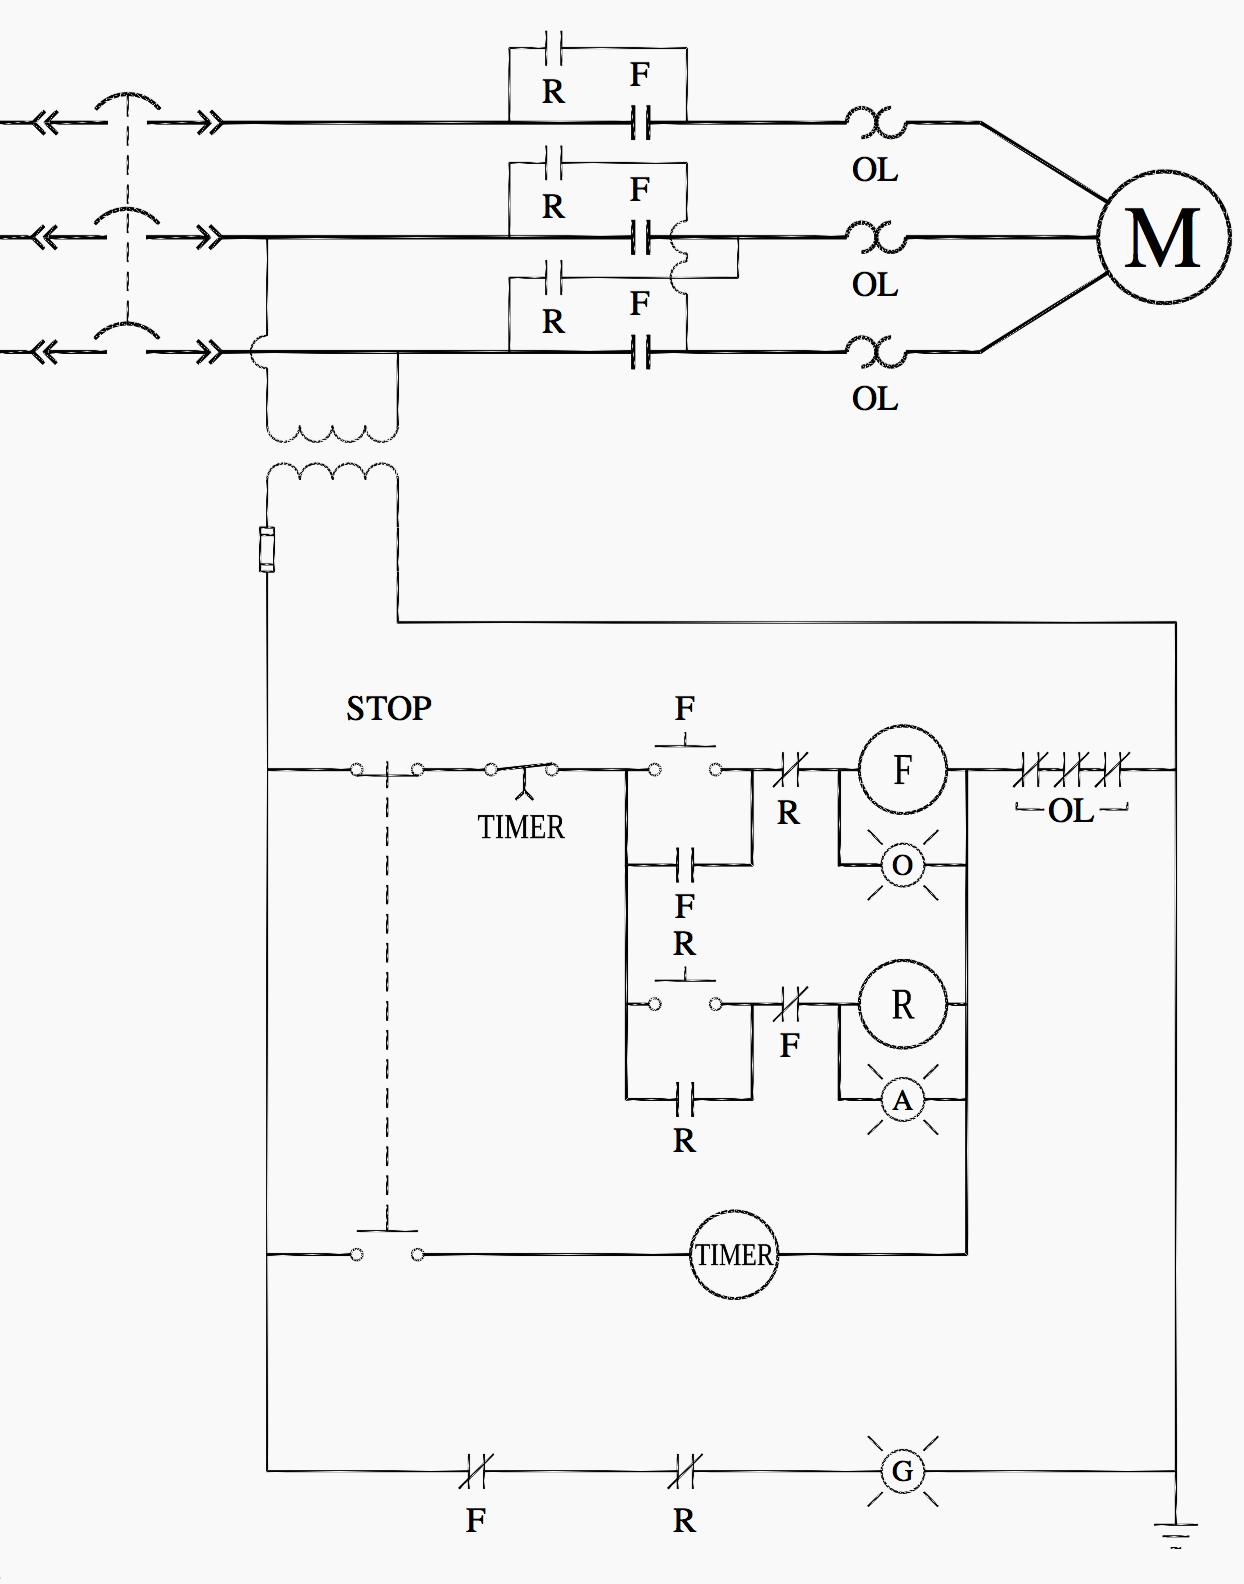 ladder logic diagram examples 3 phase panel wiring anti plugging circuit automation pinterest circuits